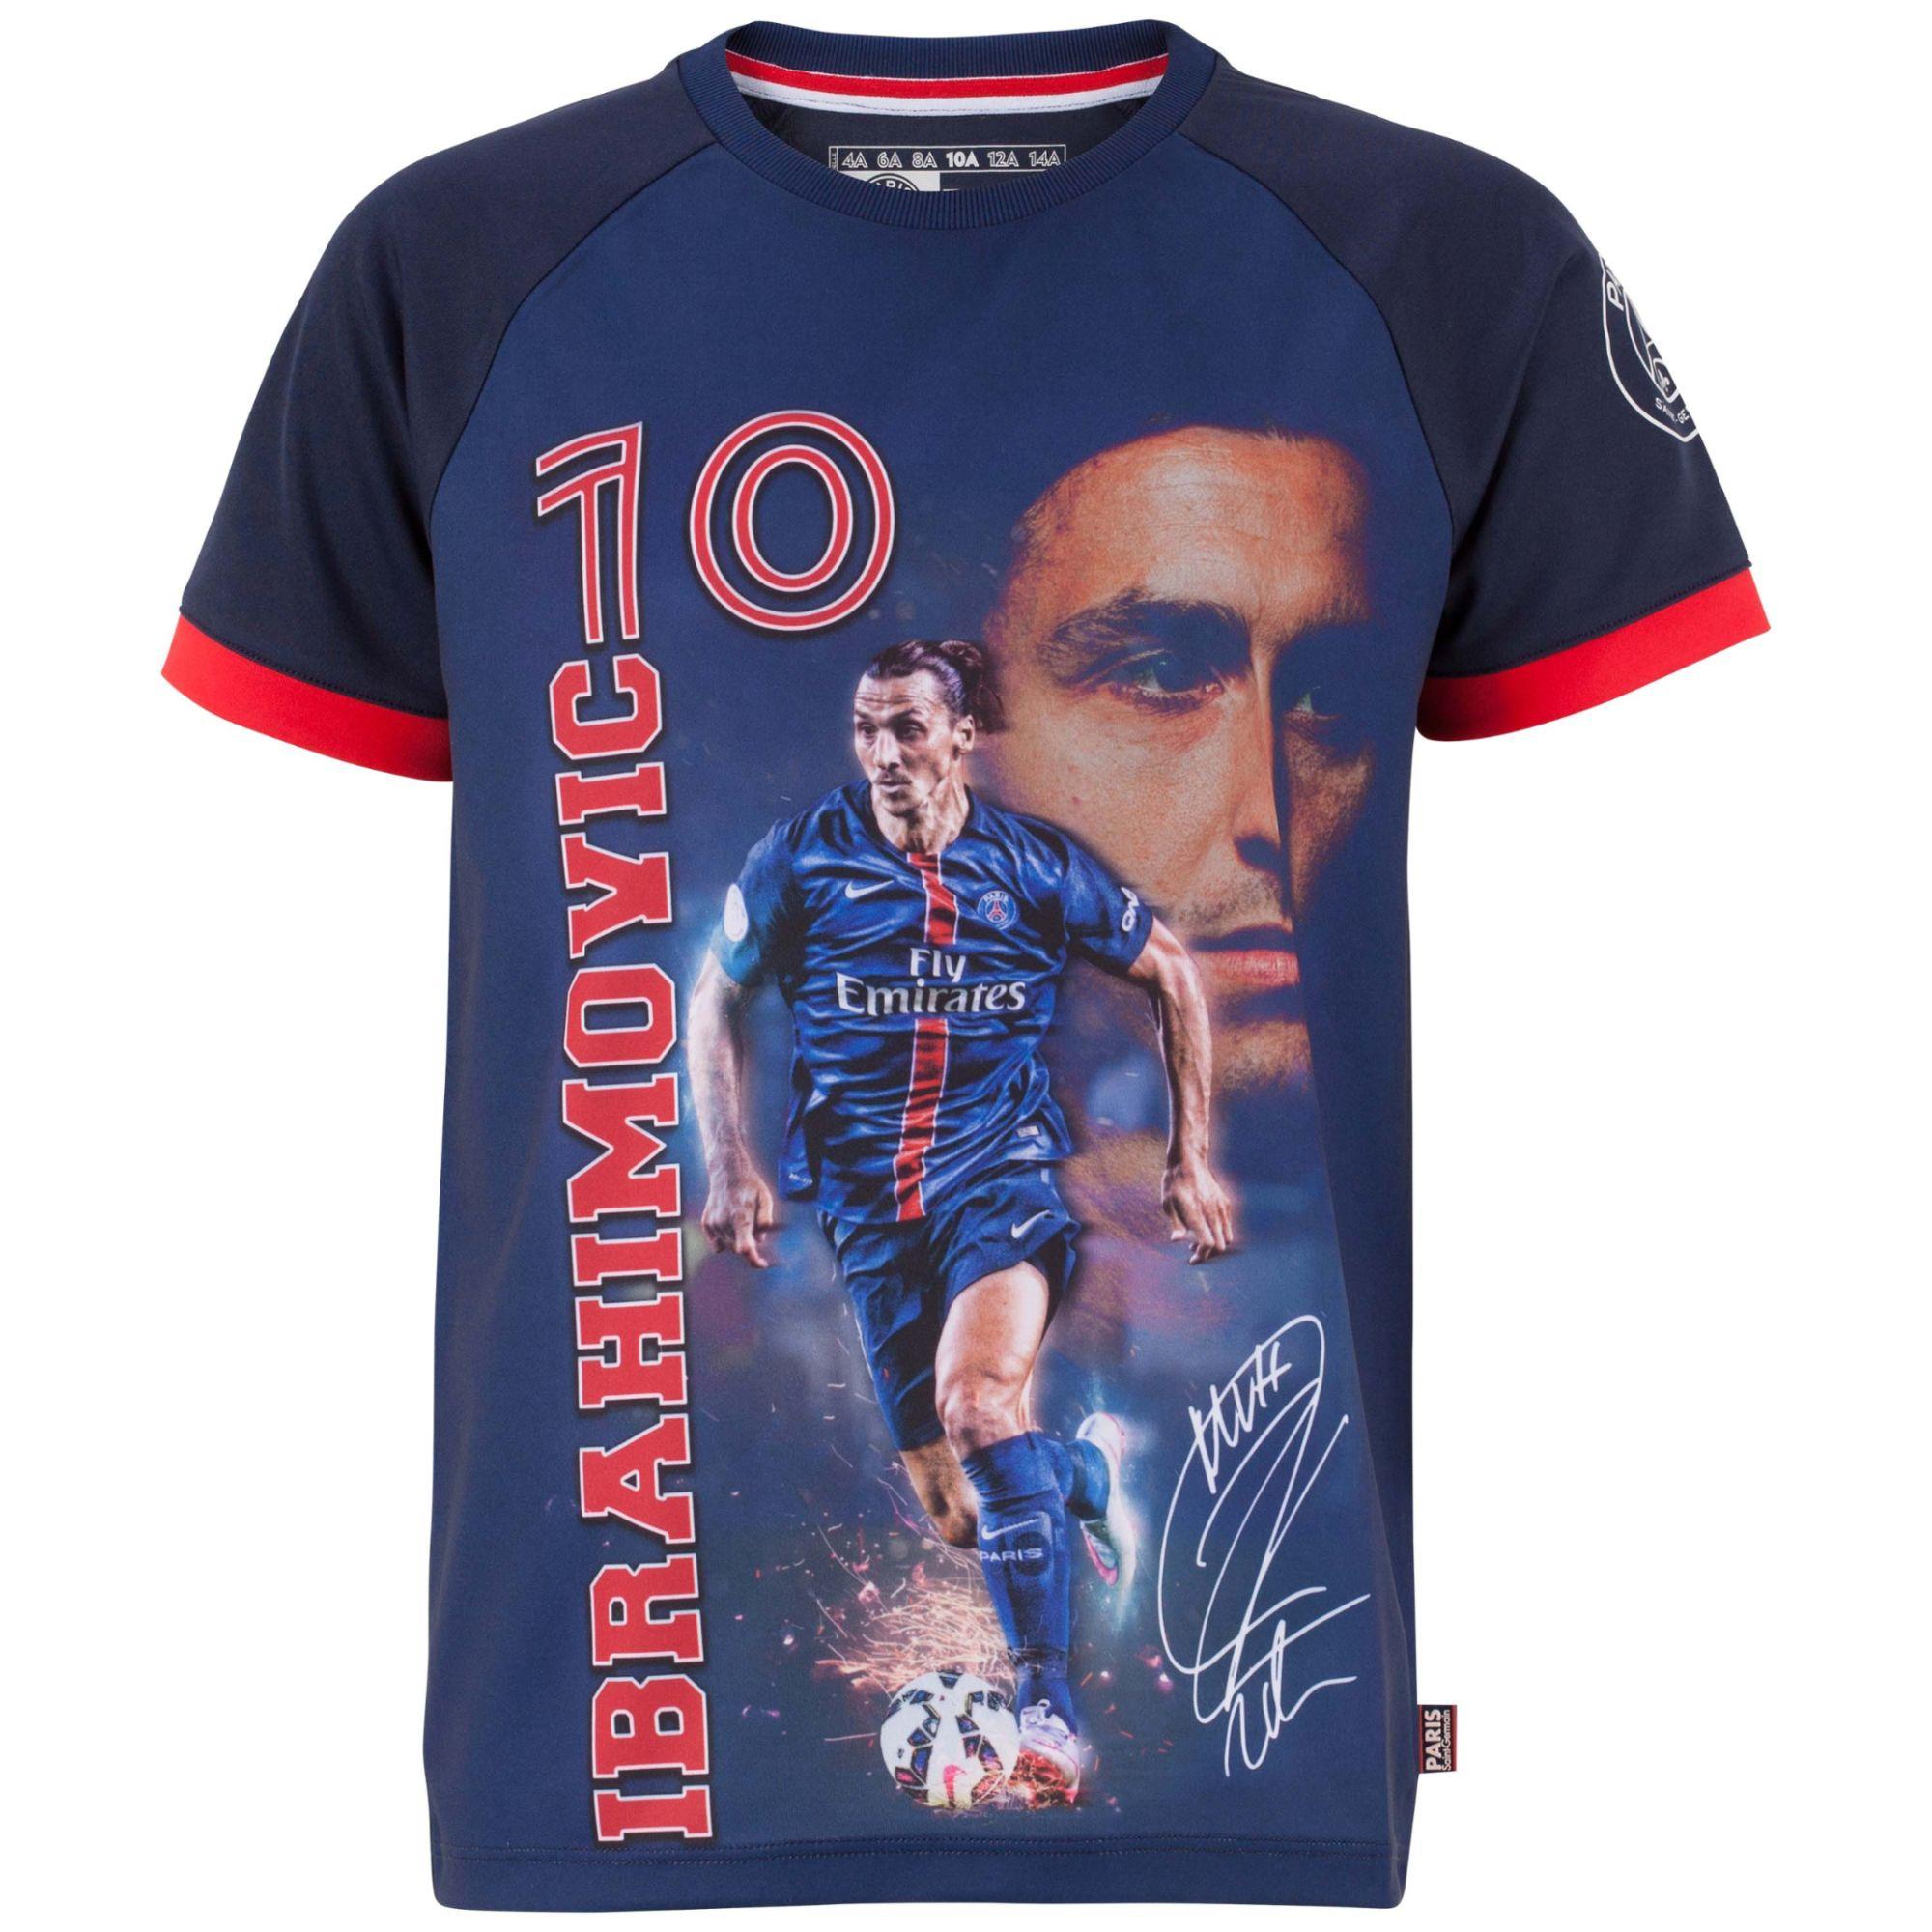 Maillot Psg - Zlatan Ibrahimovic - Collection Officielle Paris Saint Germain